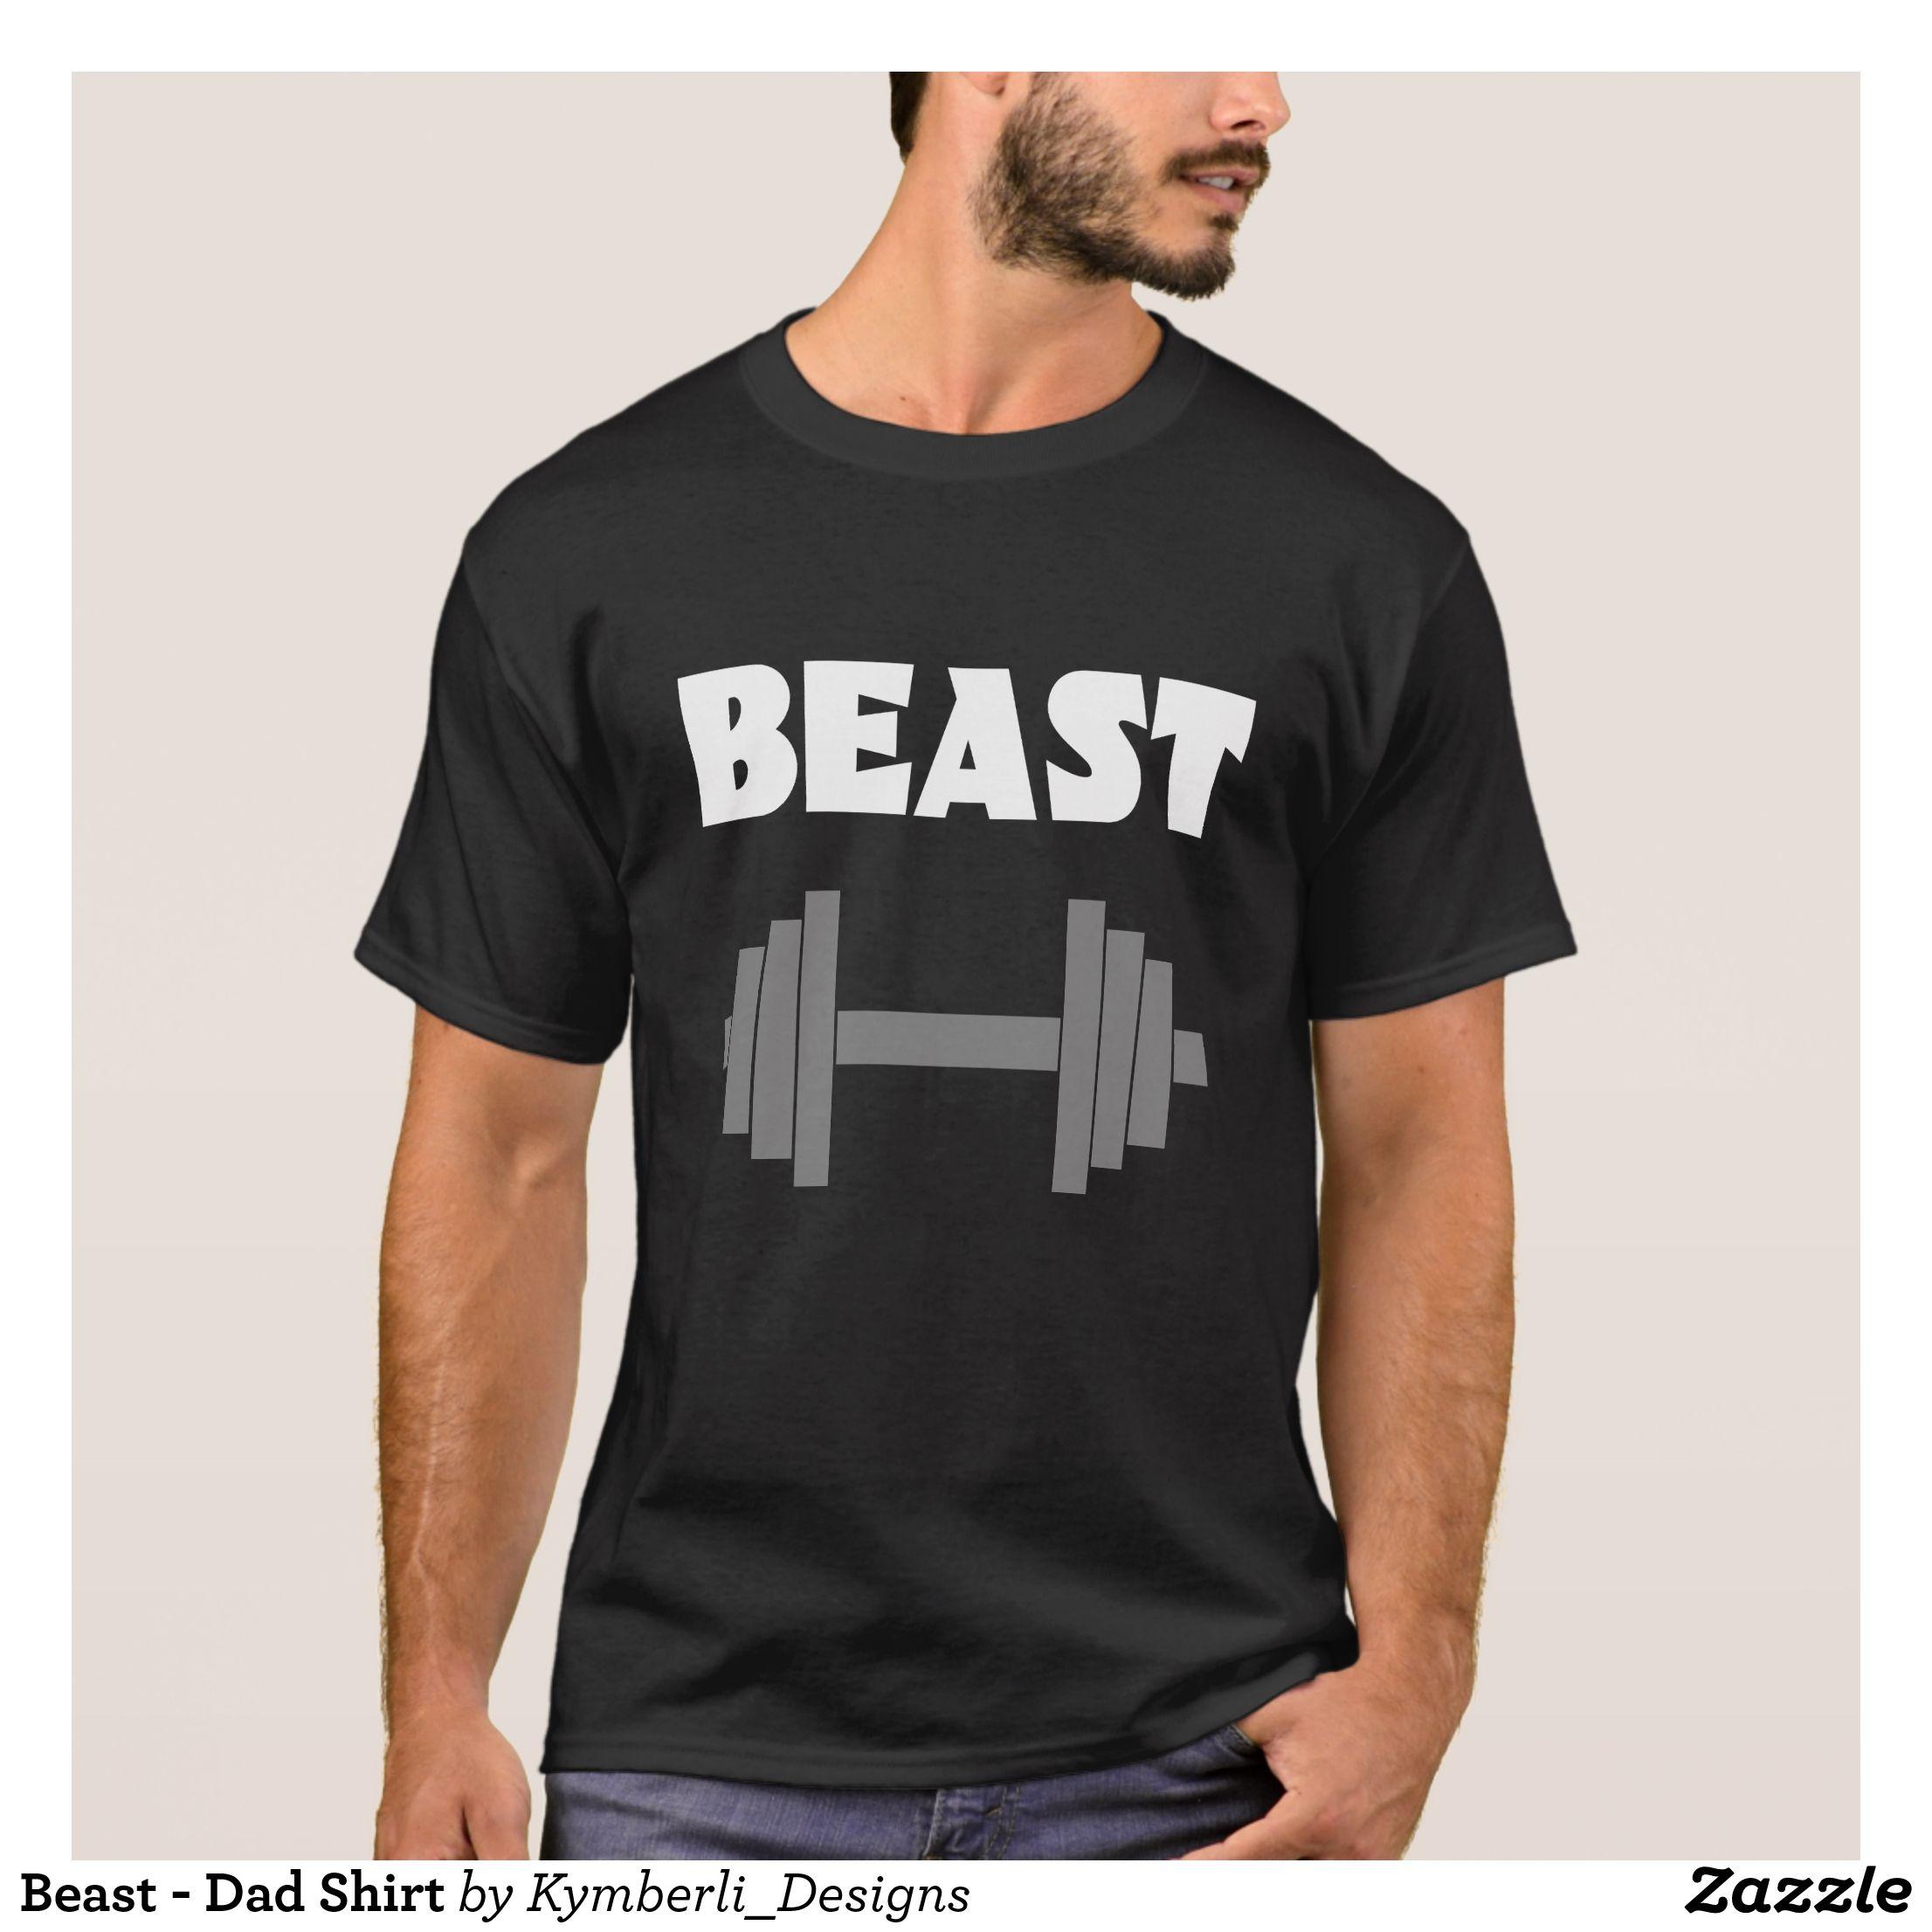 Beast dad shirt